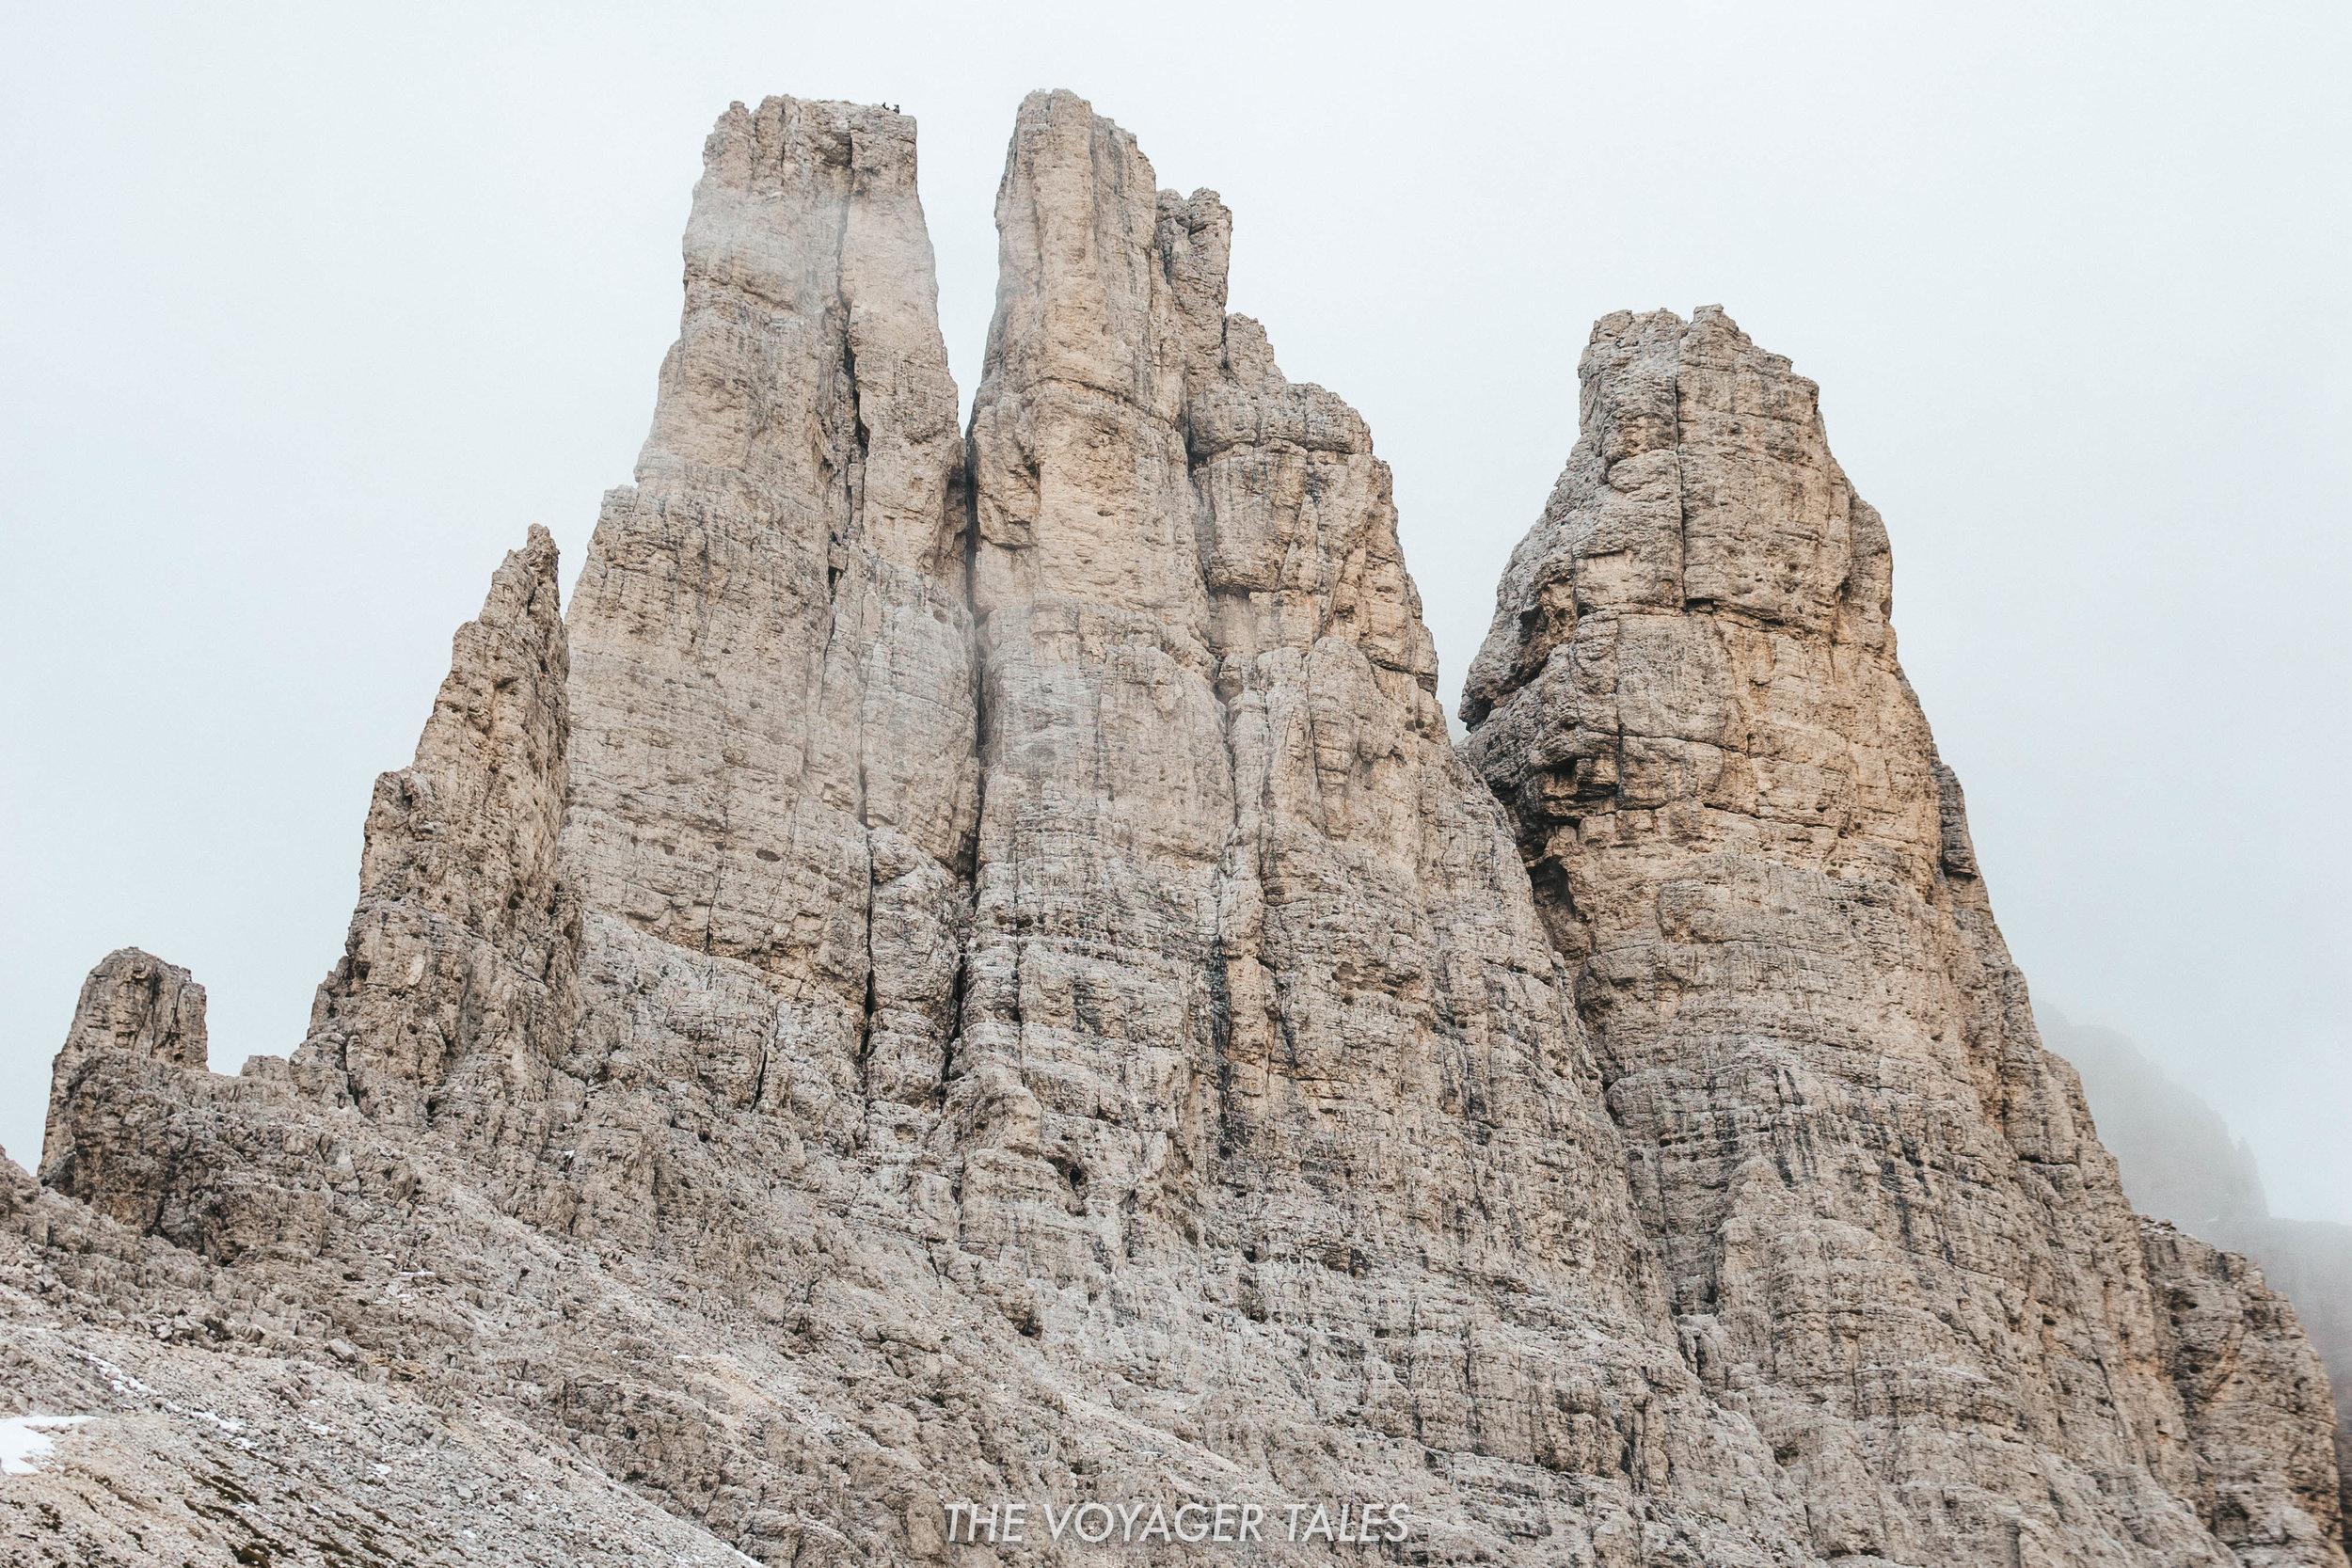 The Vajolet Towers from Rifugio Alberto